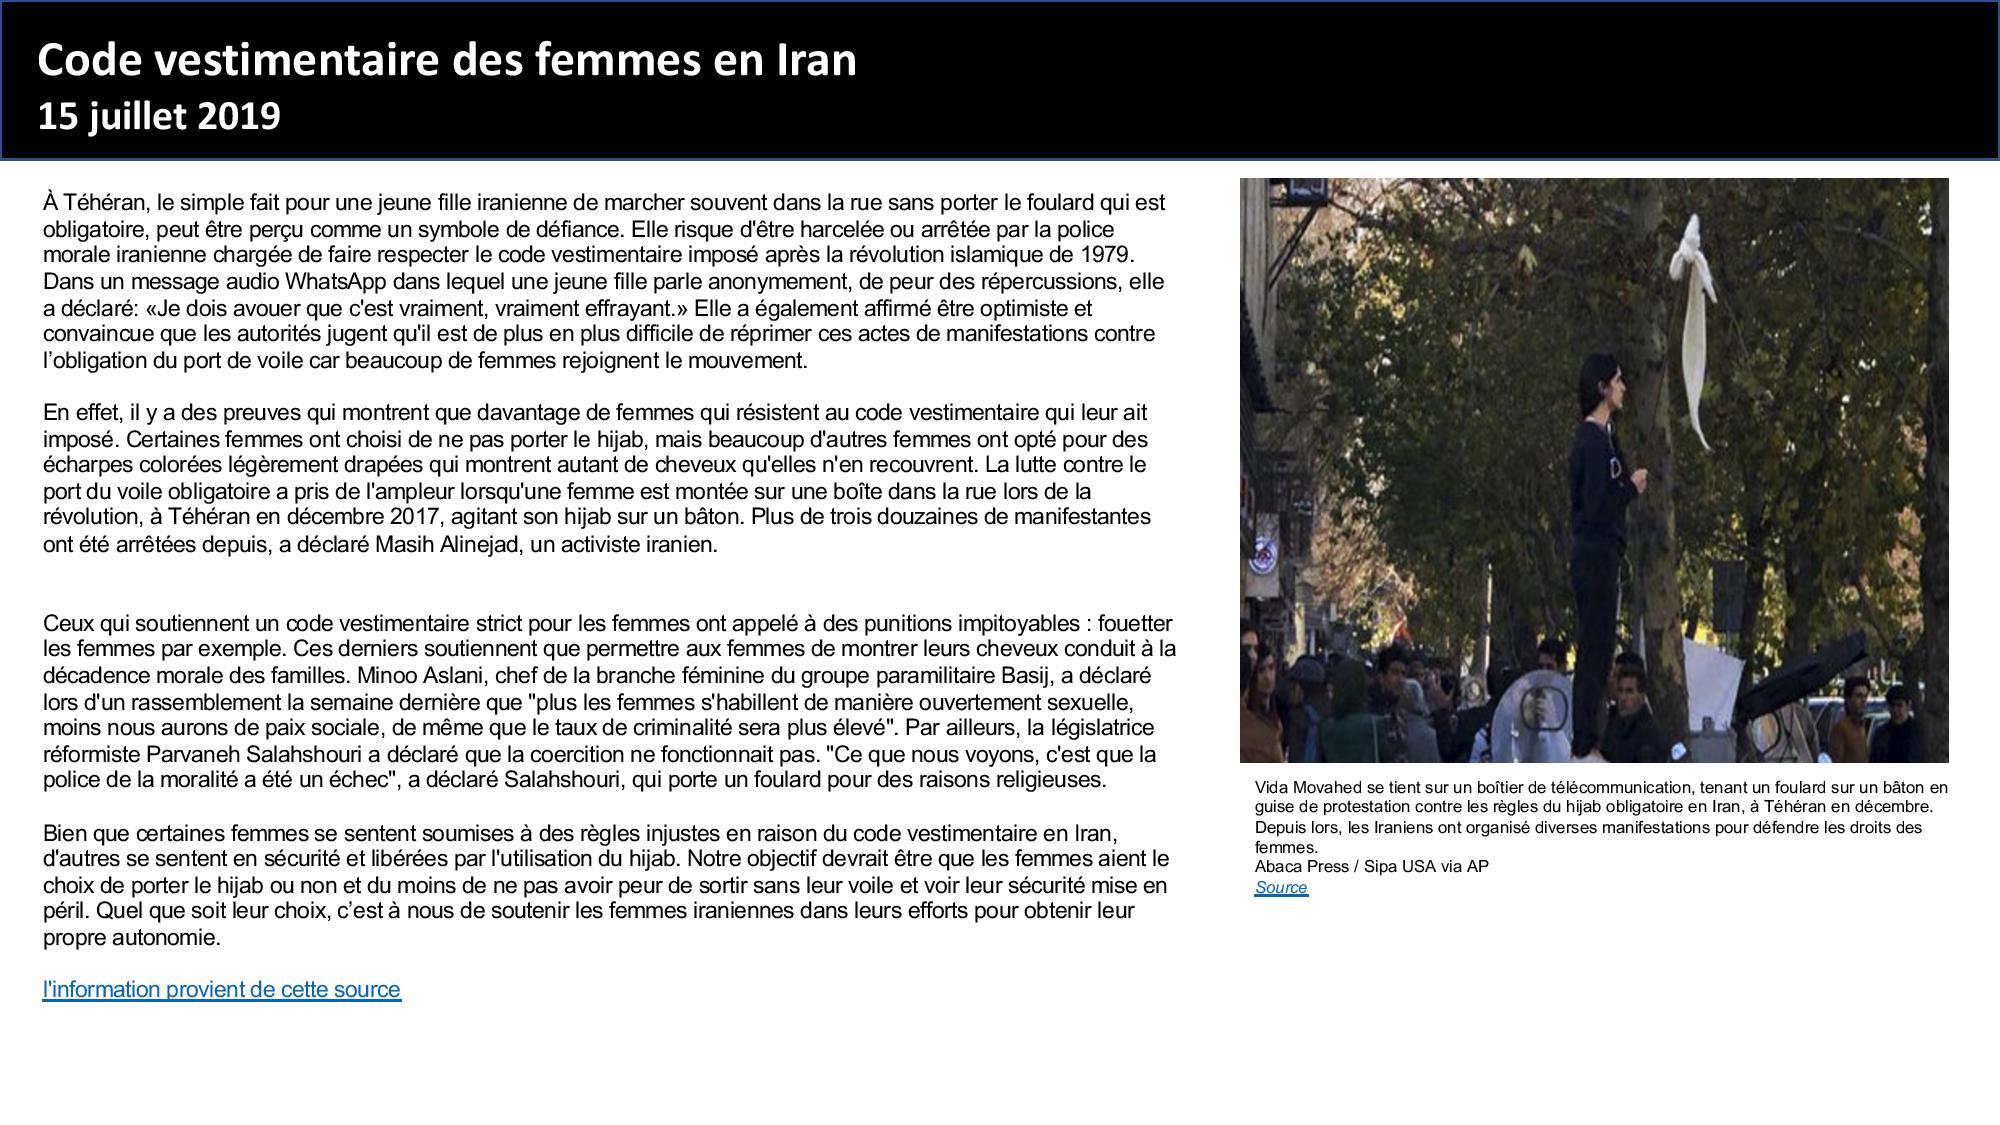 IRAN 15.07.19